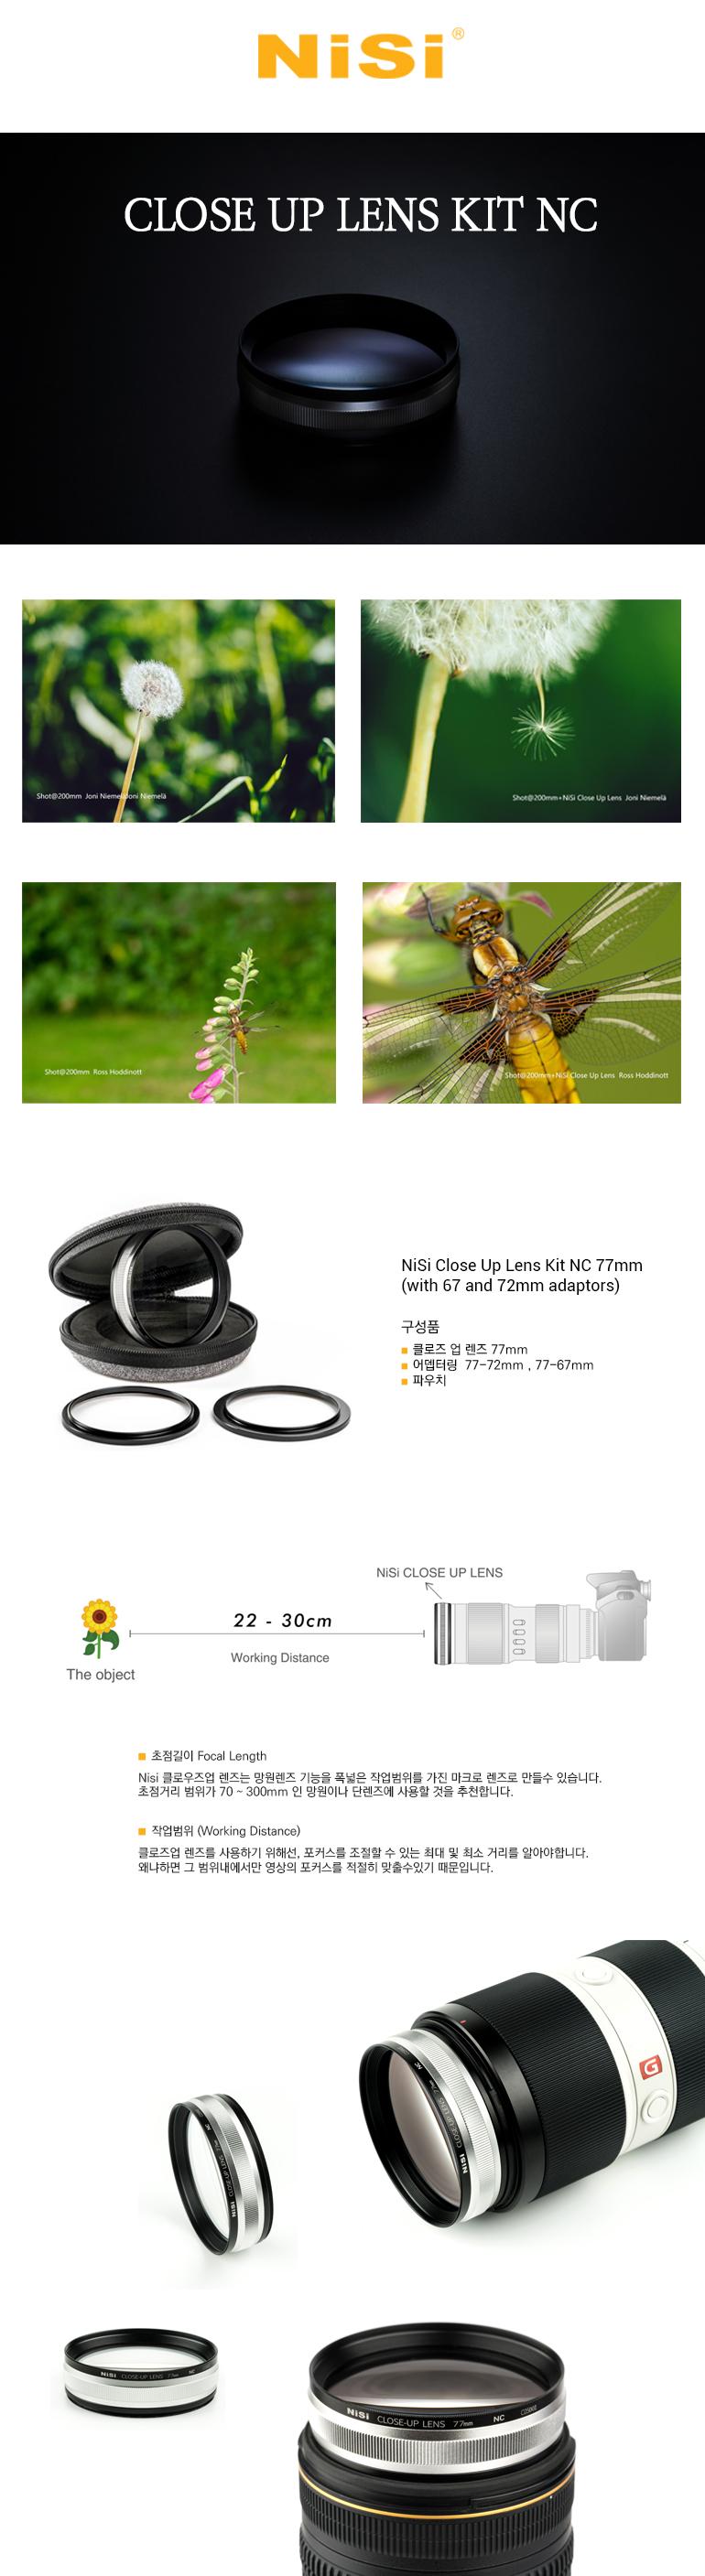 Nisi Closeup Lens leaflet 1.jpg